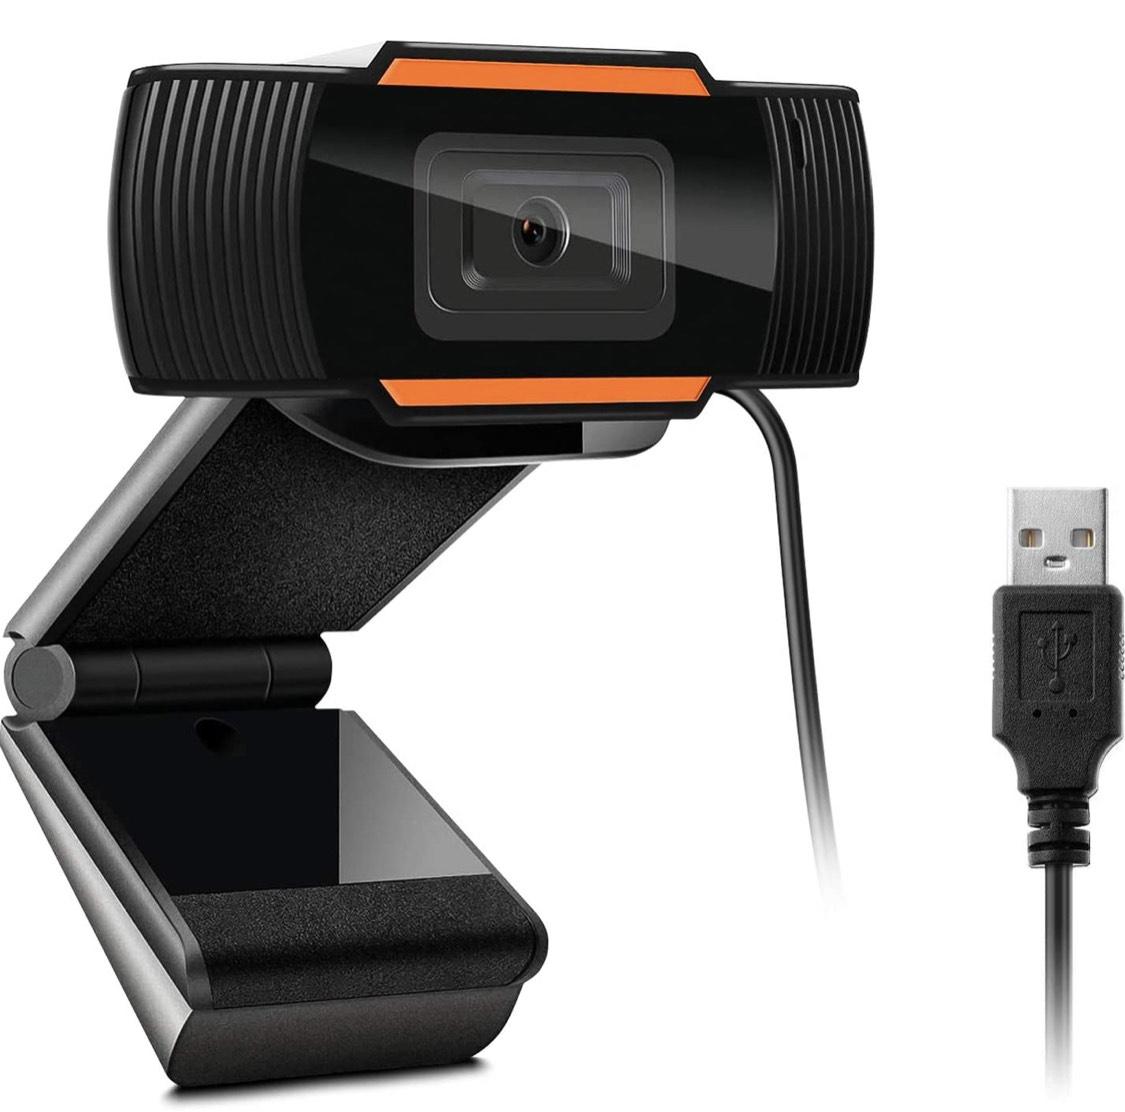 Amazon: 1080P HD Cámara Web ajustable, con micrófono